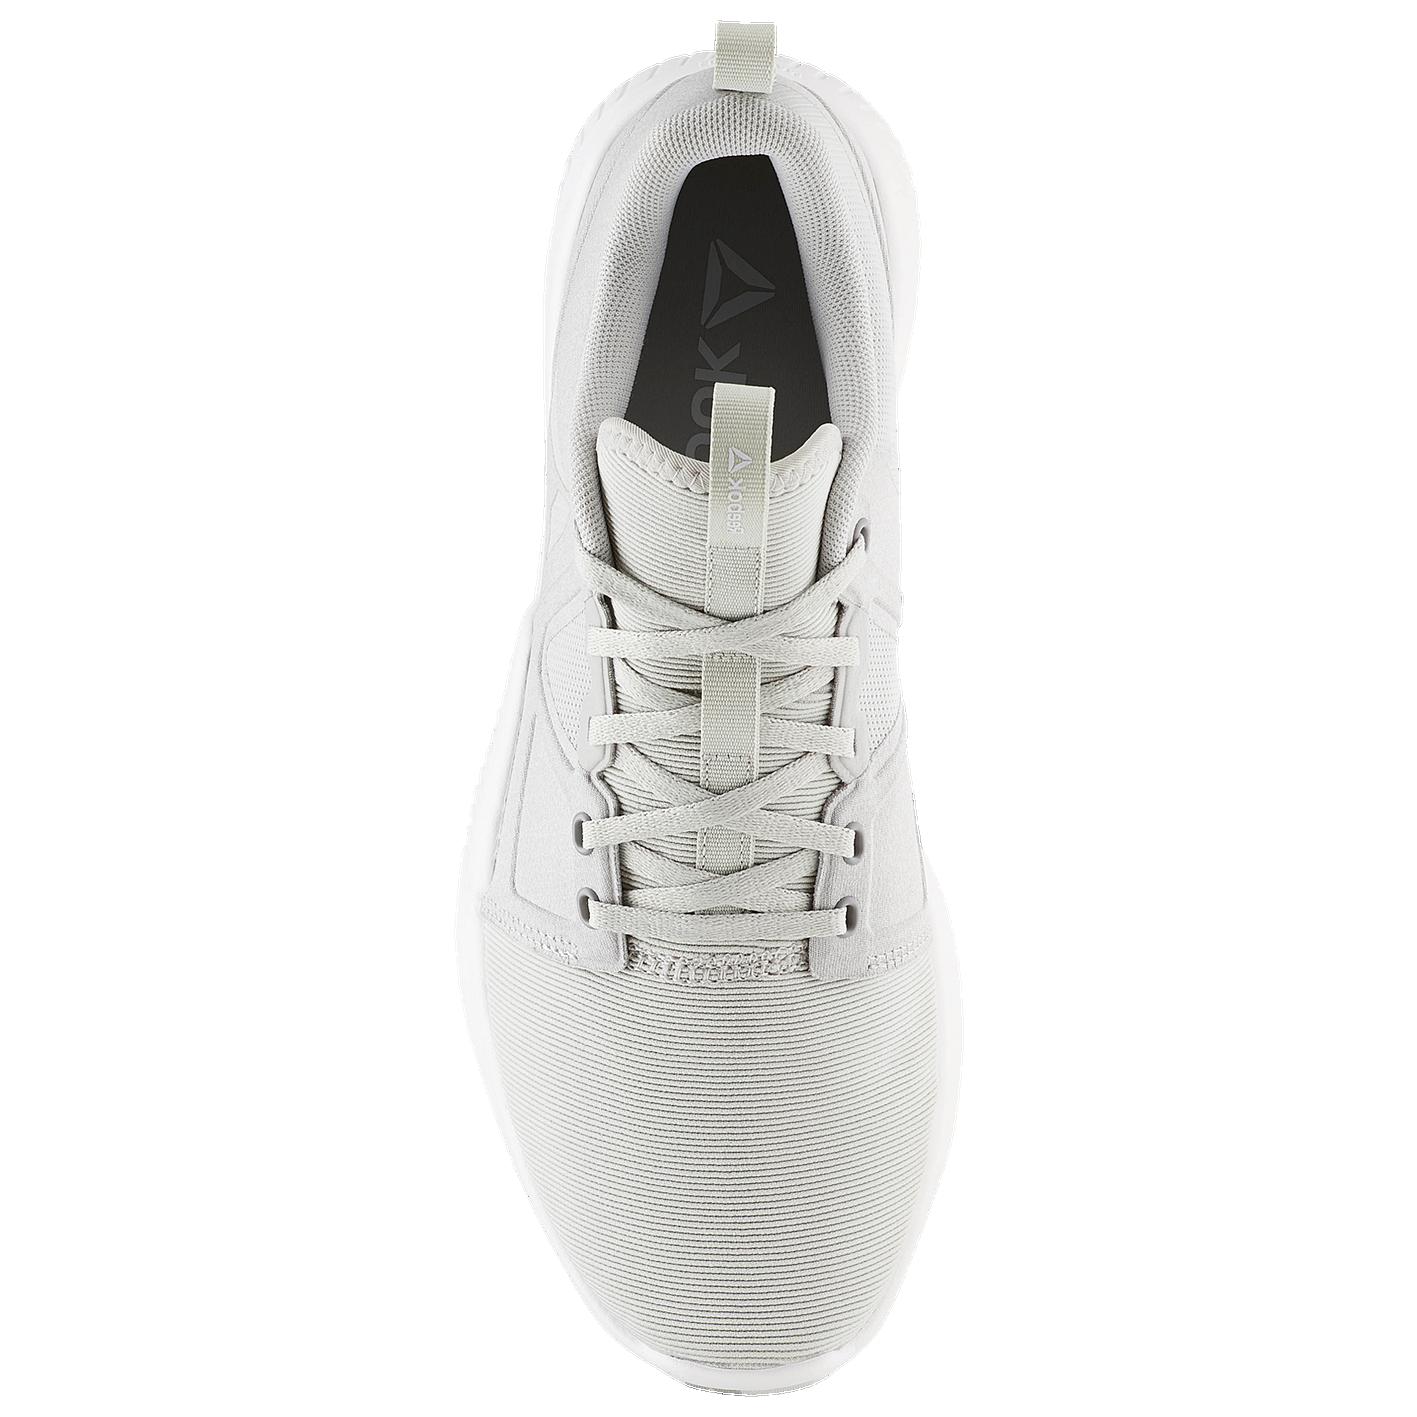 59d3d0897ce9 Reebok Hydrorush TR - Men s - Training - Shoes - Skull Grey White ...